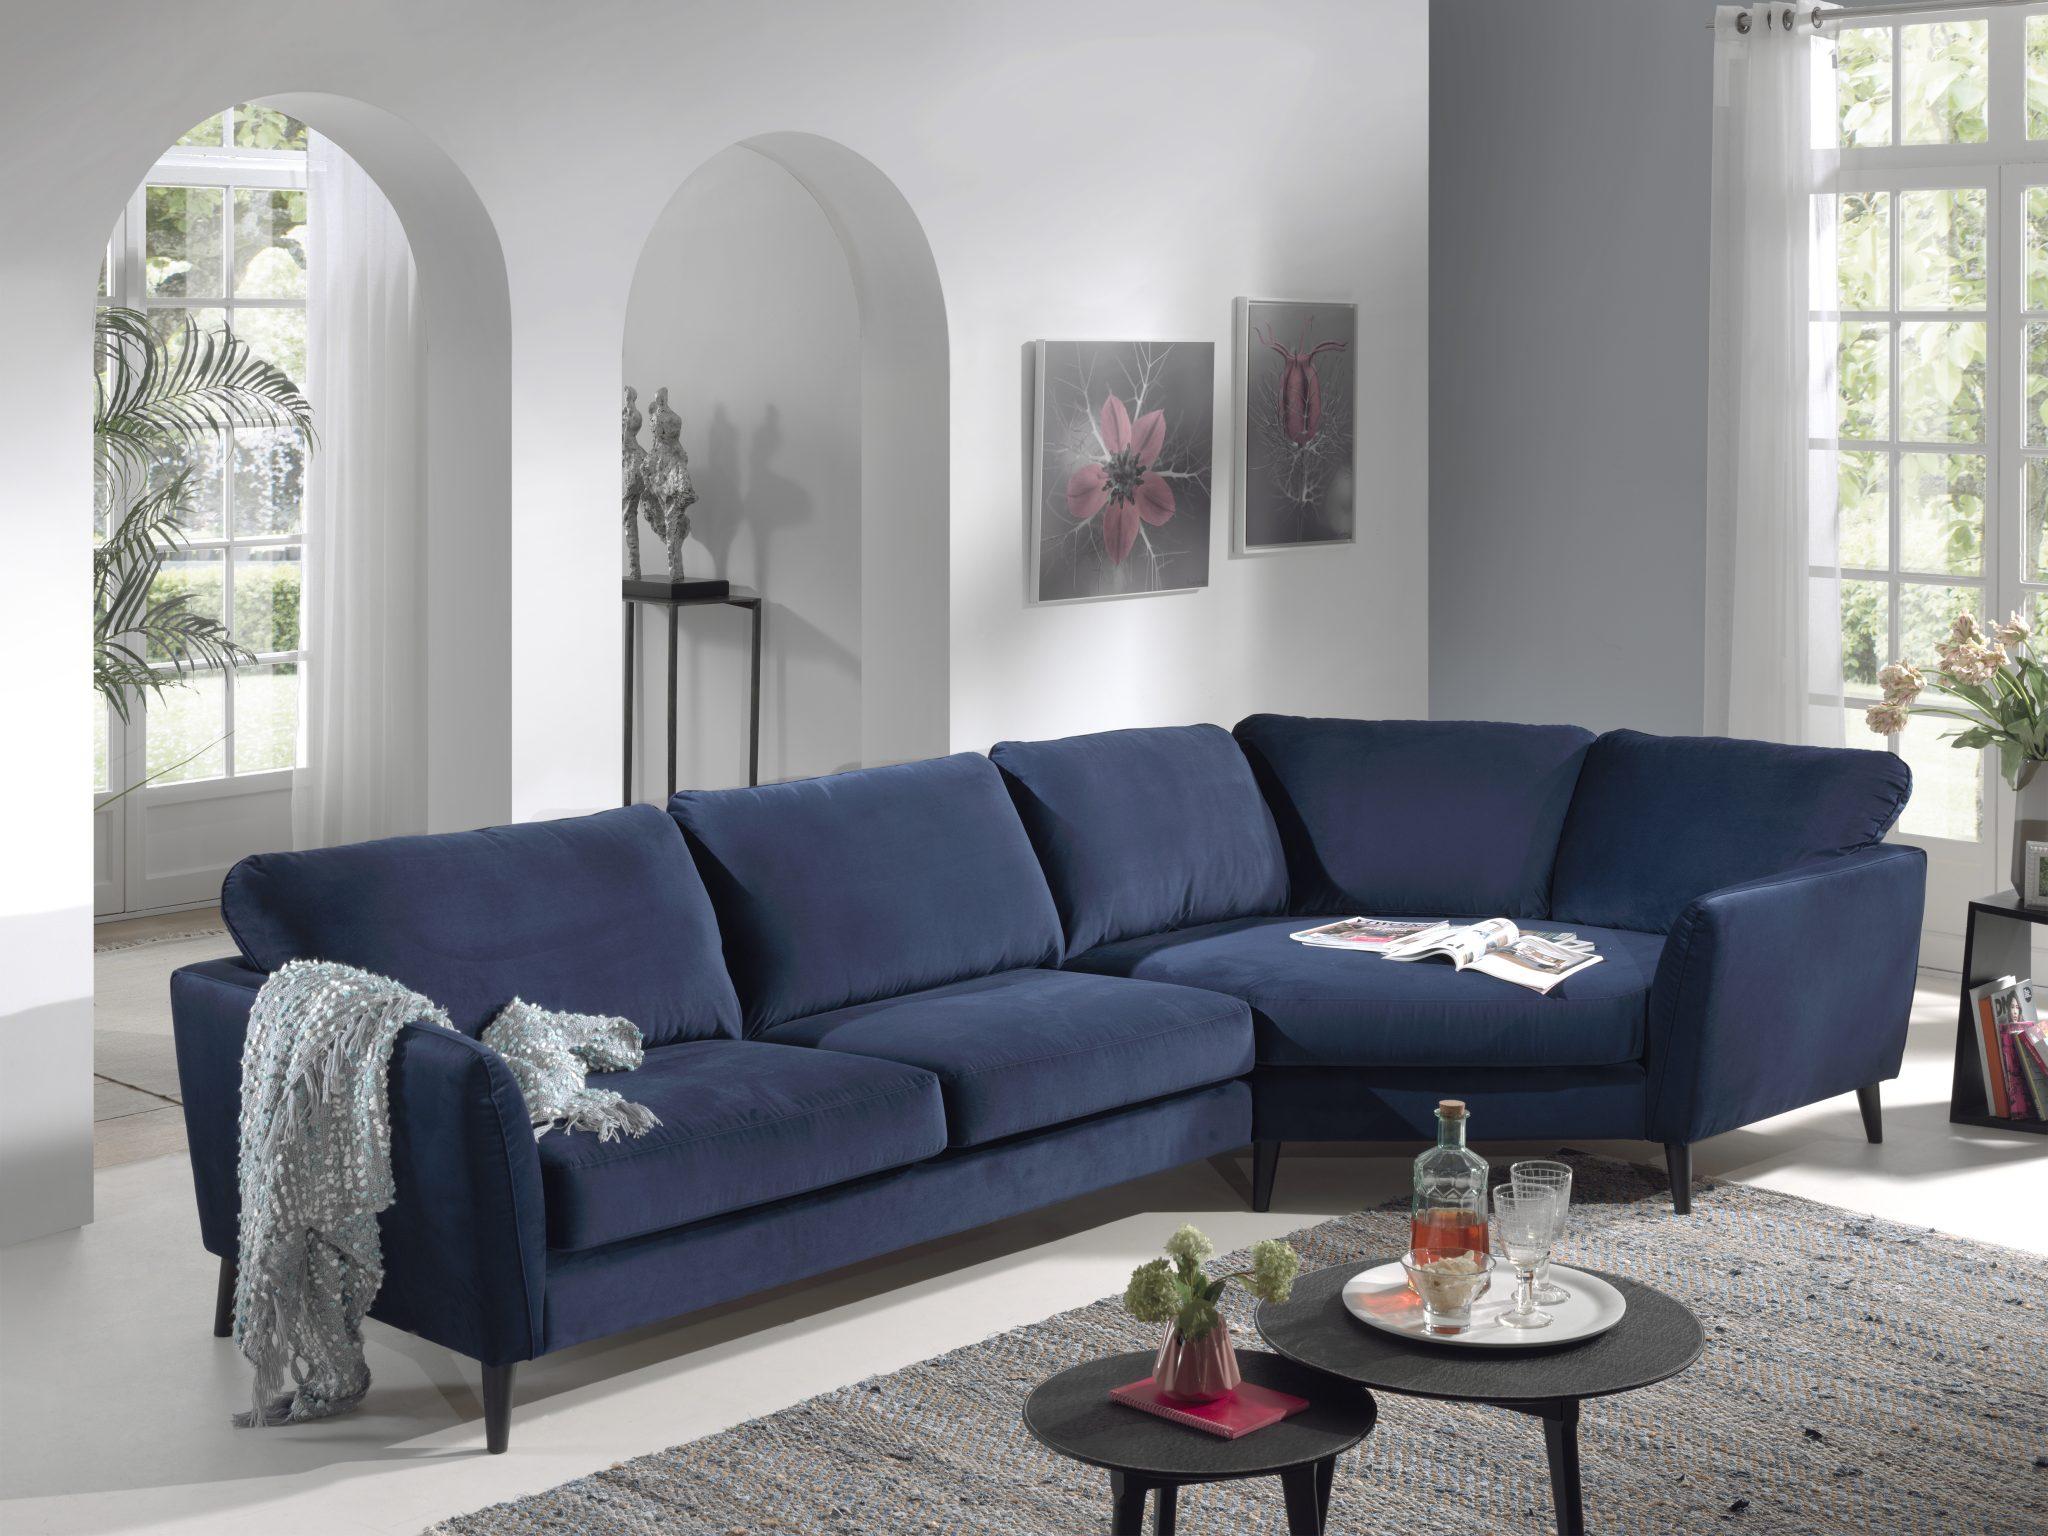 Beautiful Paris Napoli Dark Blue2 (high Rez) Softnord Soft Nord Scandinavian Style  Furniture Interior Design